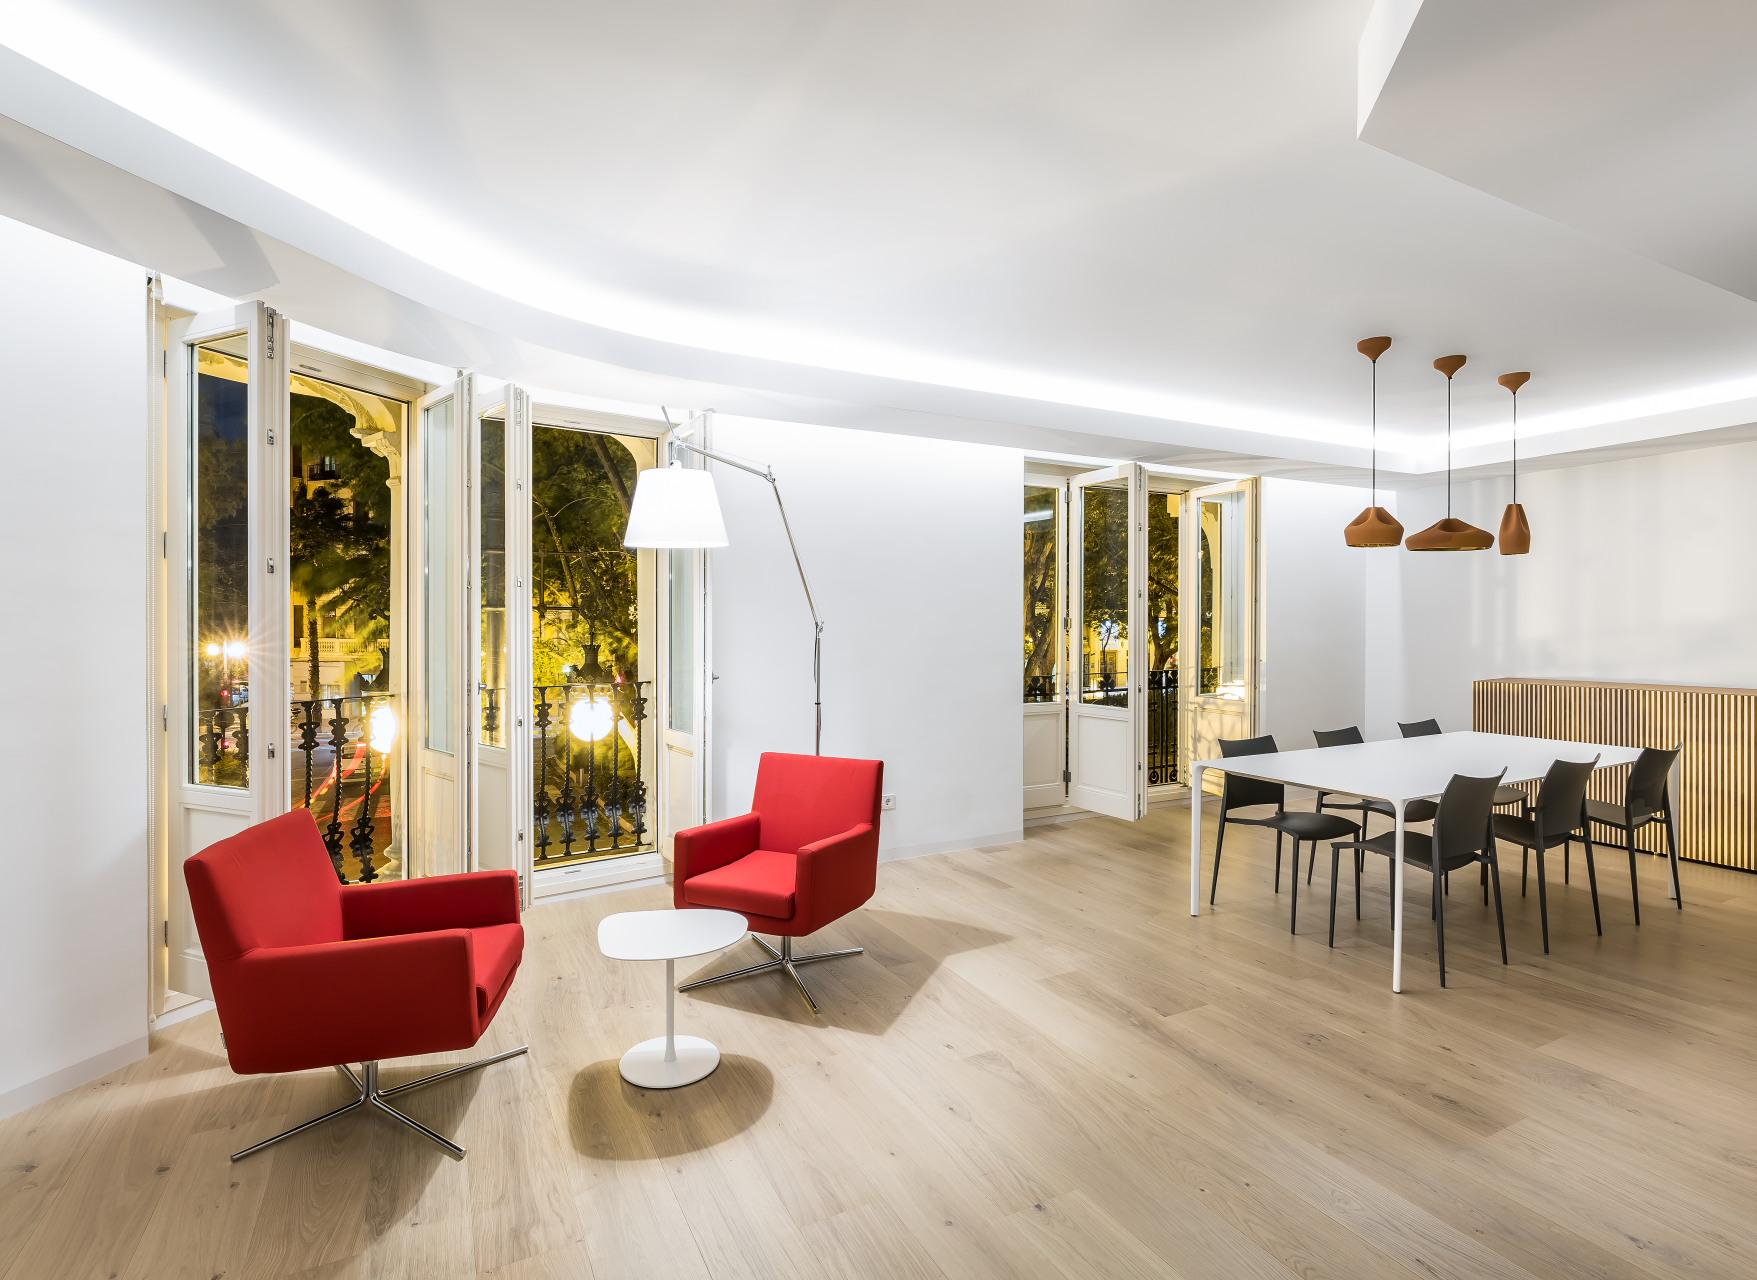 fotografia-arquitectura-interiorismo-valencia-german-cabo-gallardo-llopis-bfm-edificatoria-turia02 (22)